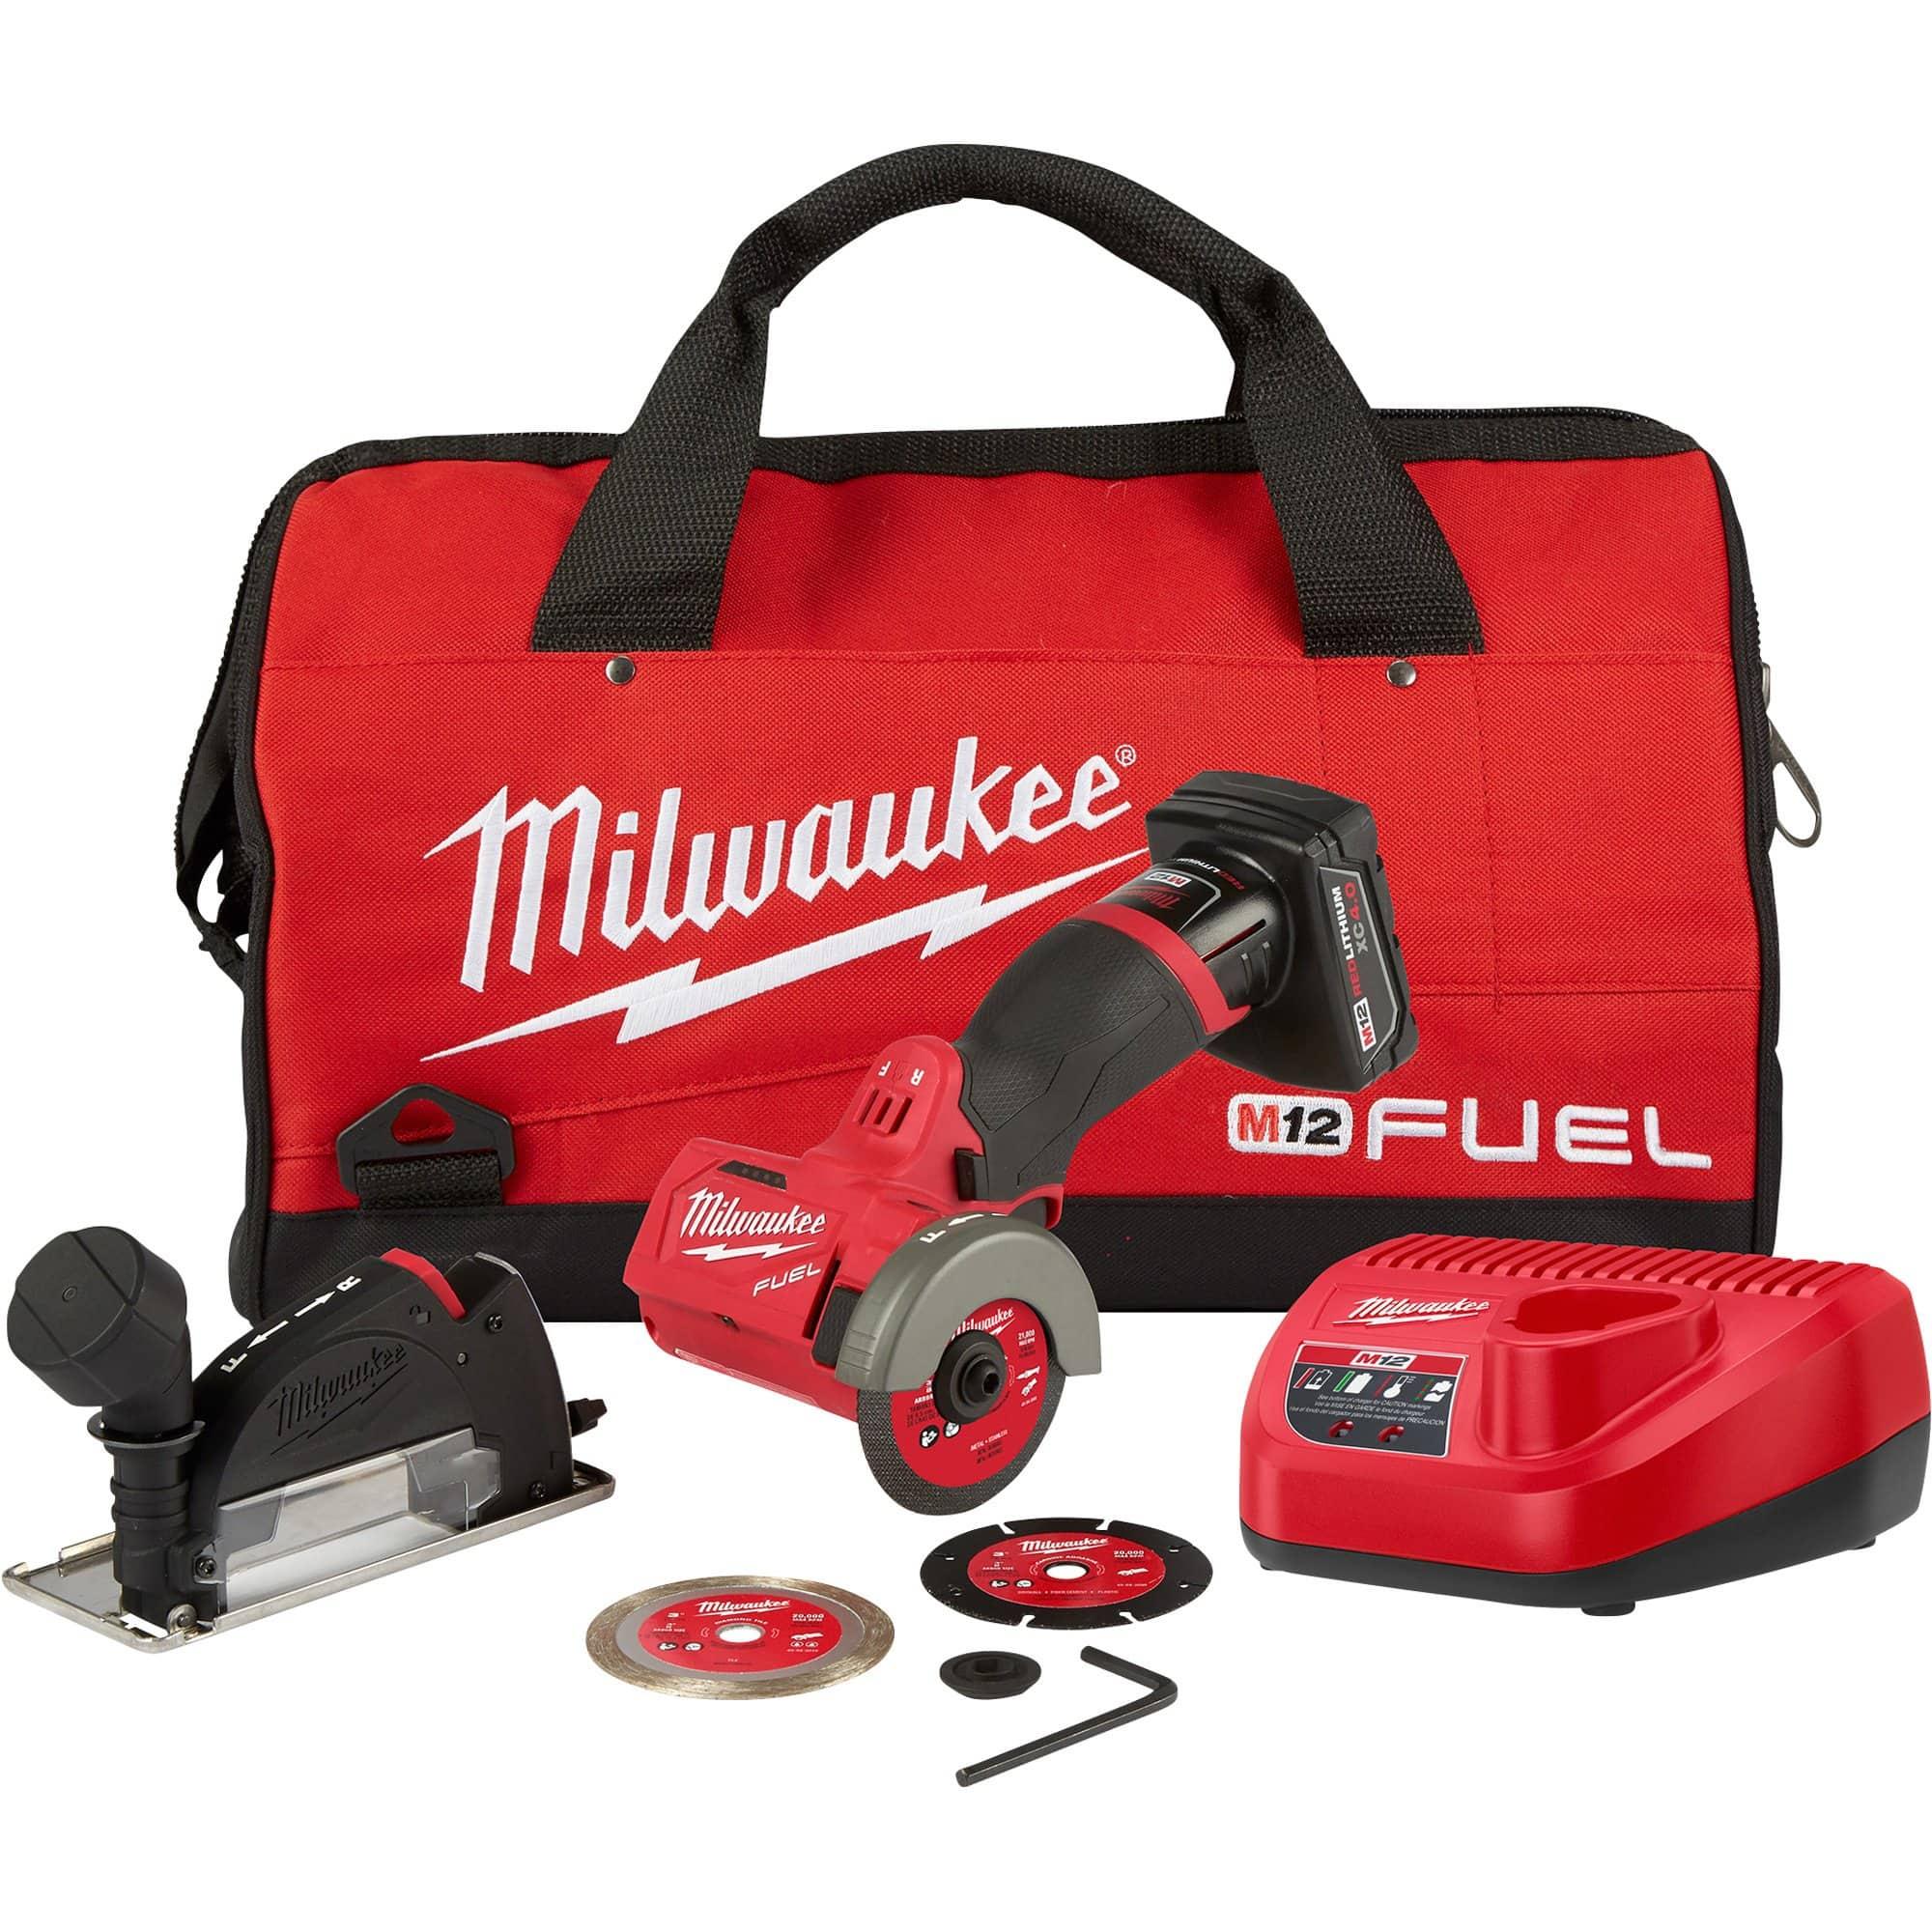 "Milwaukee M12 FUEL 12V Brushless 3"" Cut Off Saw Combo Kit"